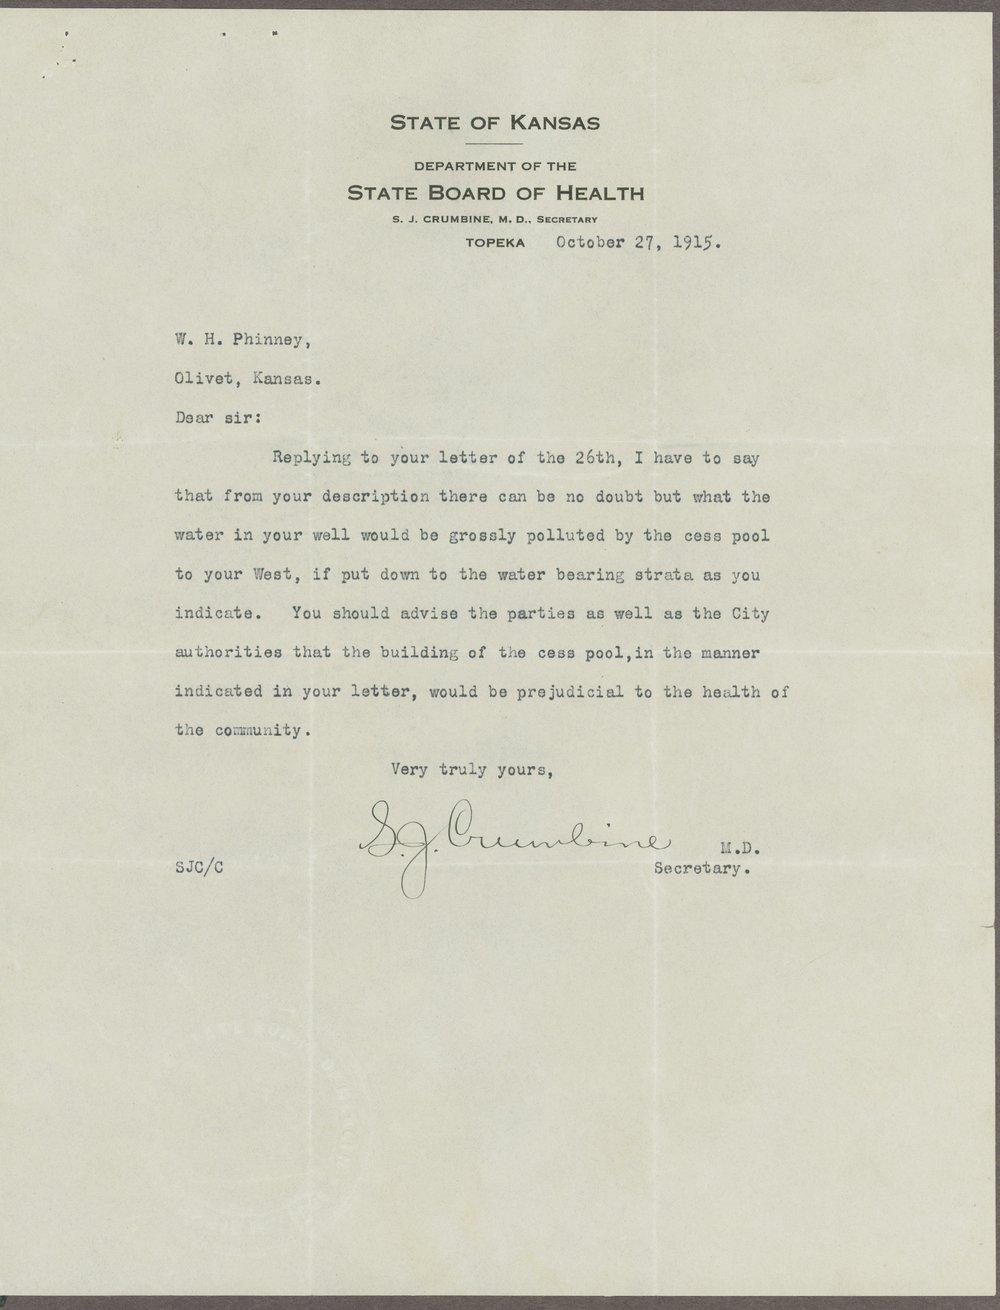 William H. Phinney to Samuel J. Crumbine - 1